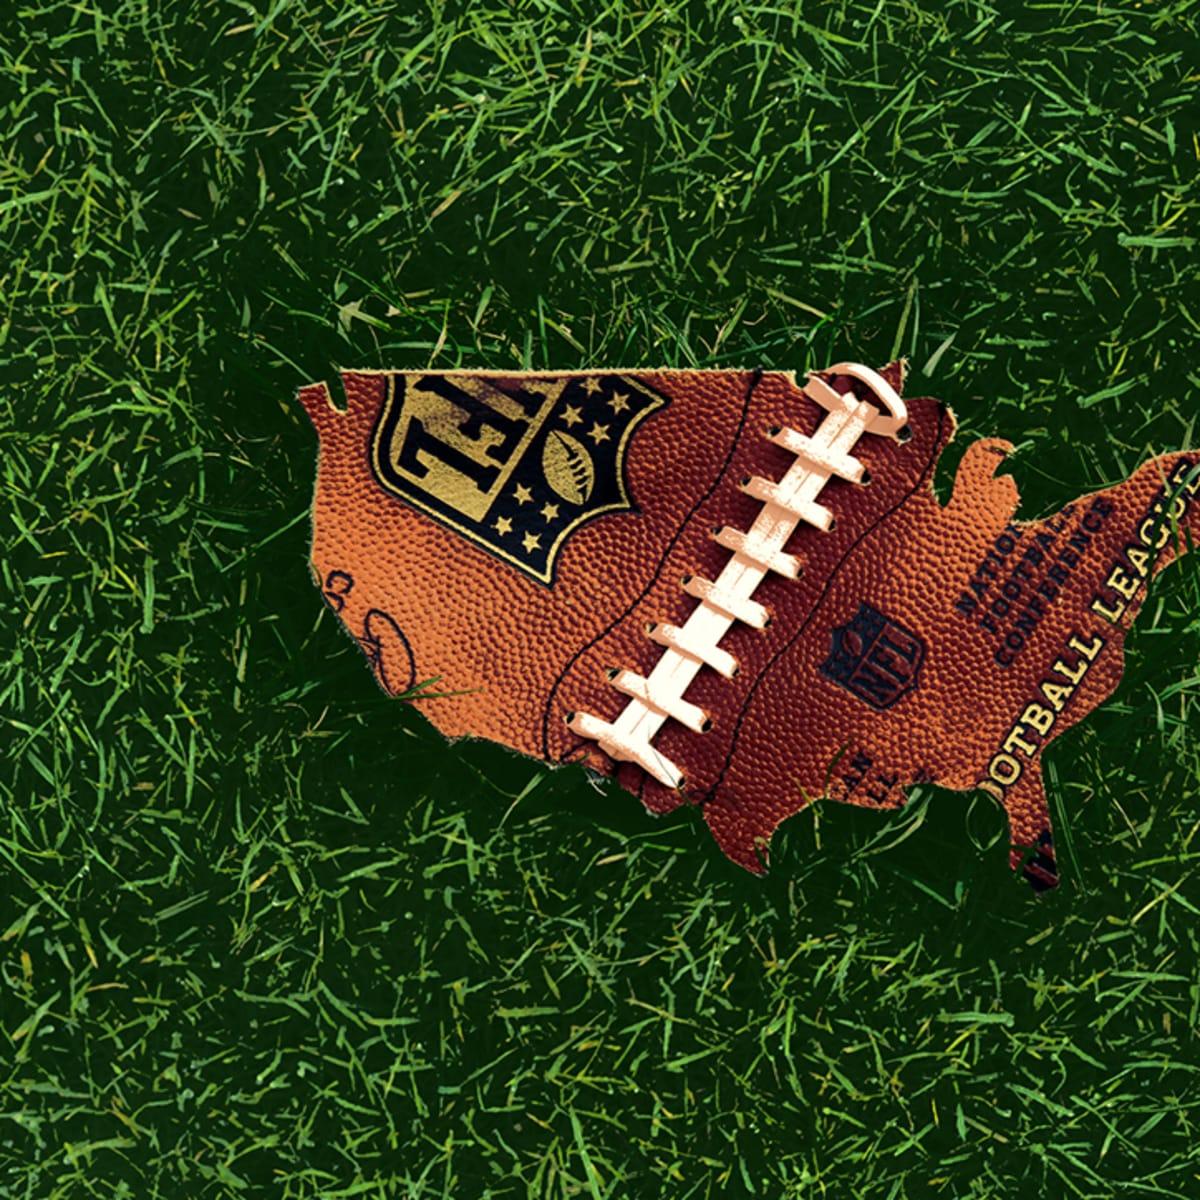 Alabama Arkansas I Sure Miss My Ma And Pa Lyrics football in america: survey of nfl, college football